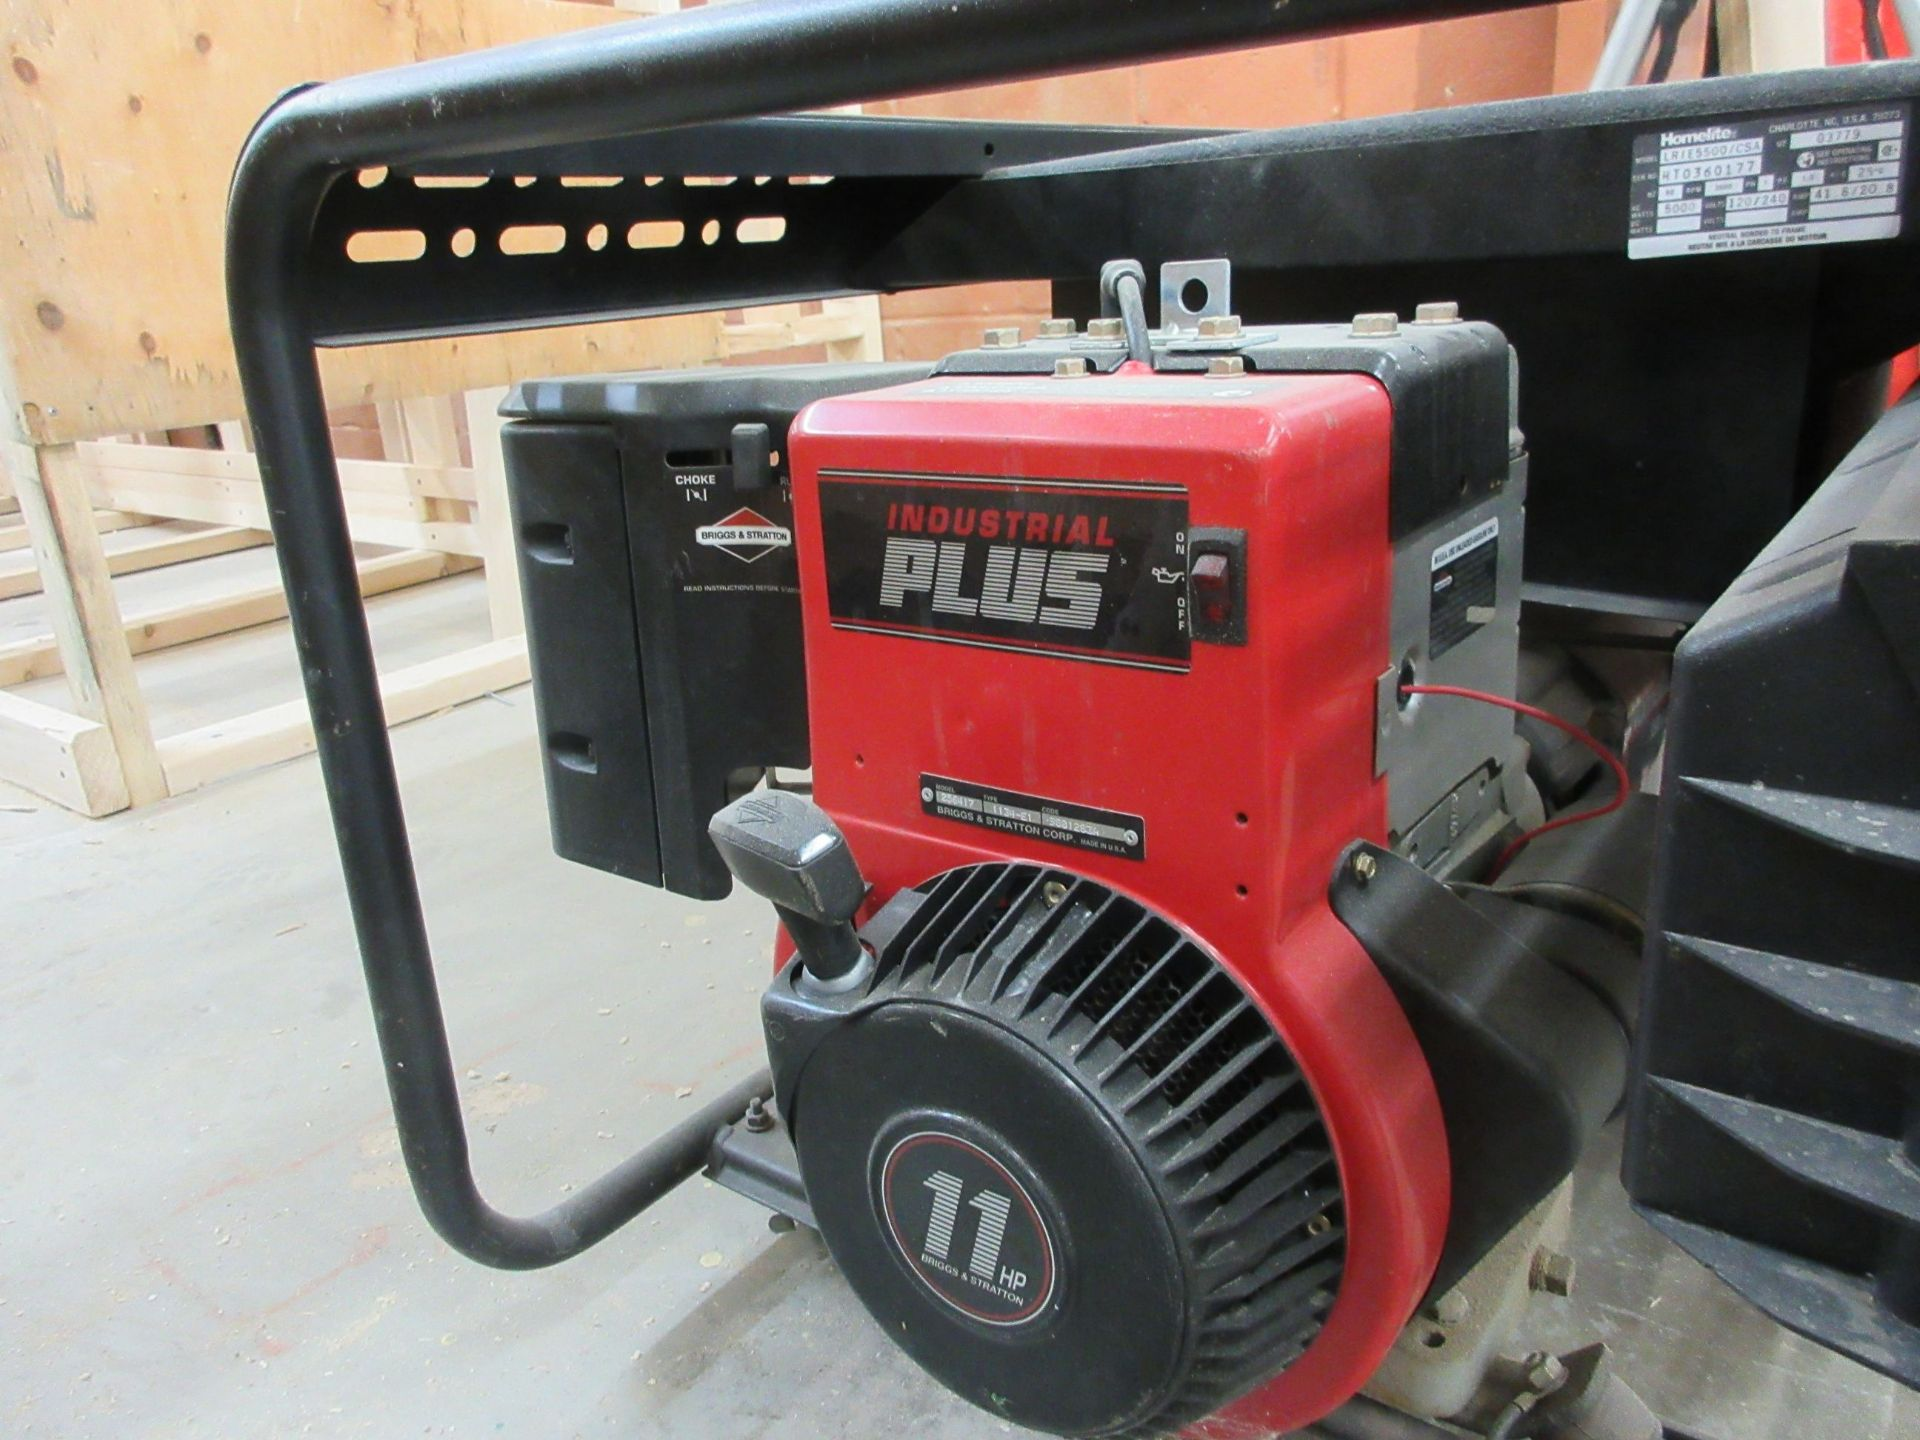 Lot 203 - HOMELITE LRIE 5500 generator, 11 HP, 5500 watts